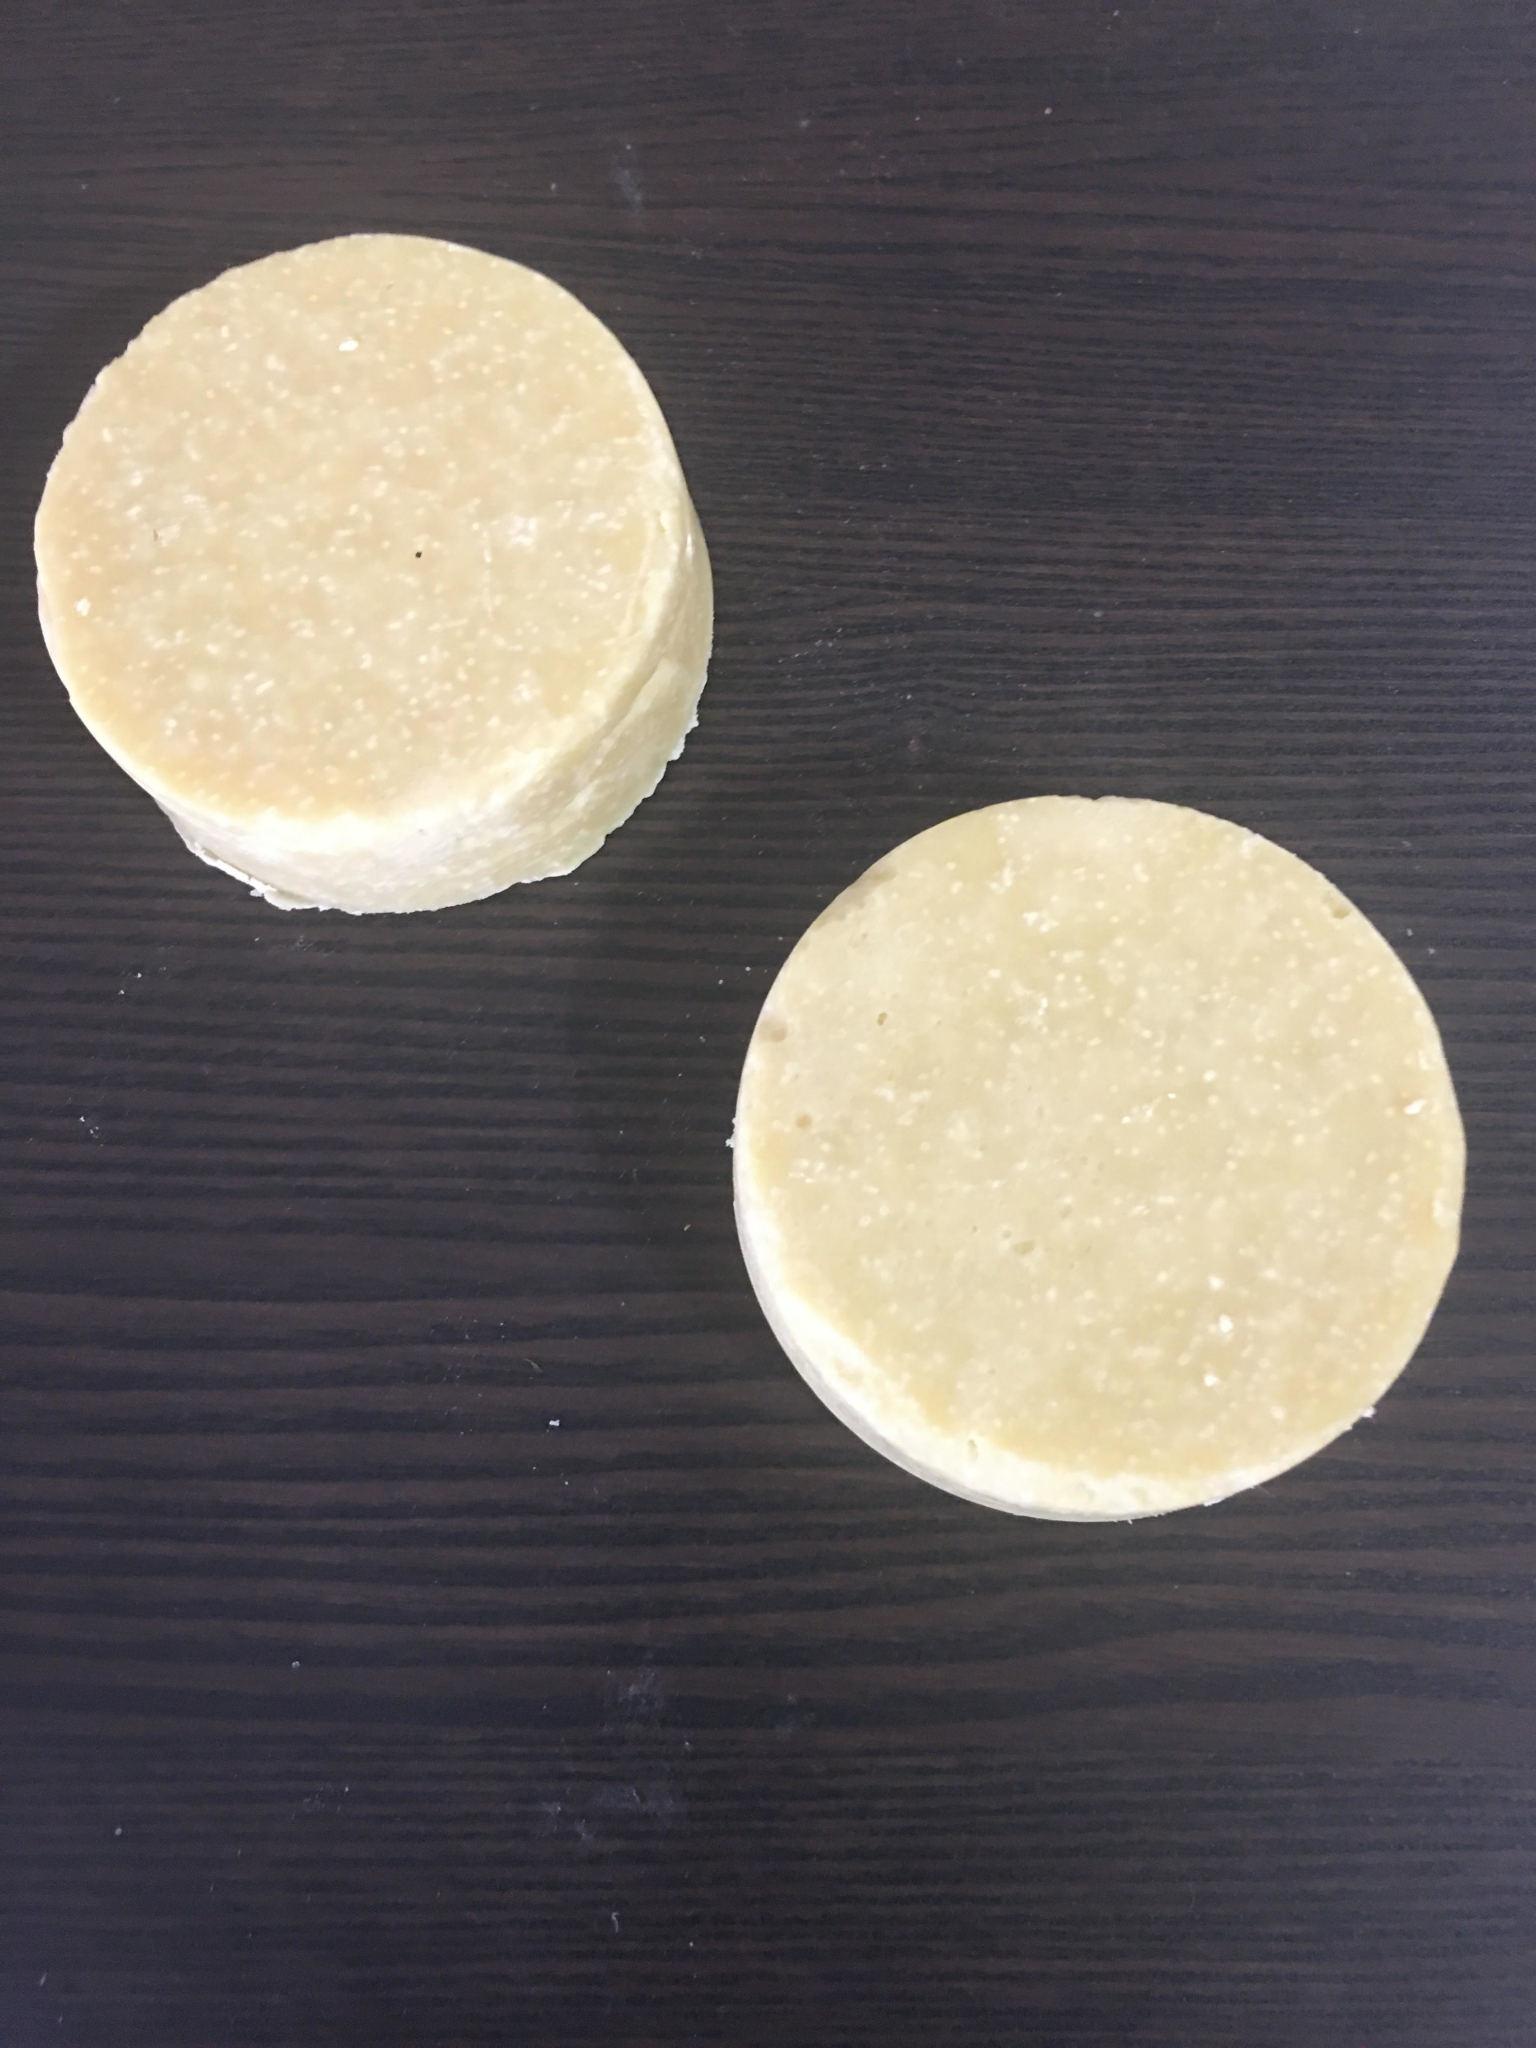 Shaving Soap Refill- Two bars